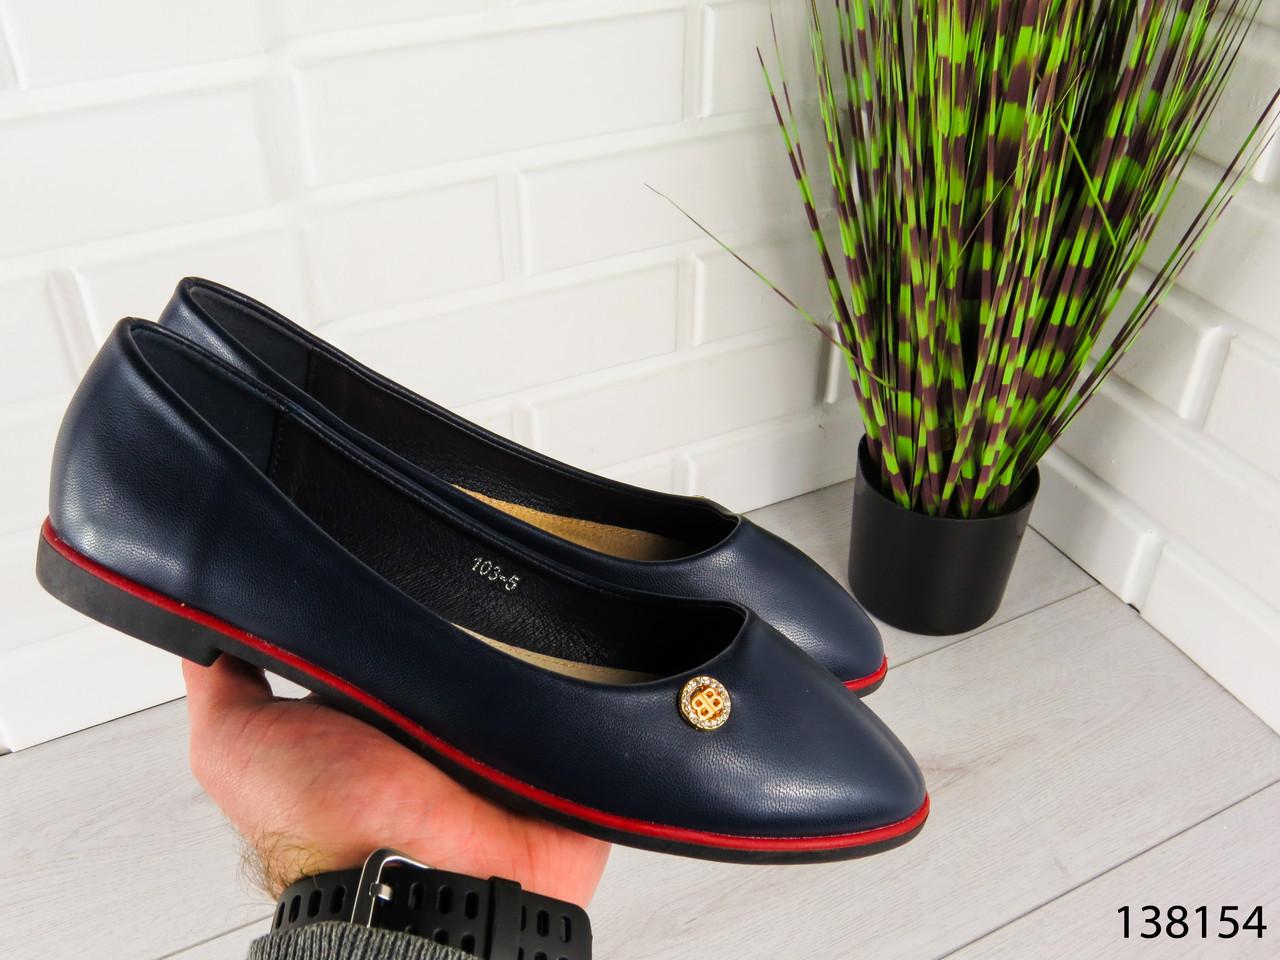 18e13b27a ... Балетки женские, туфли женские синие